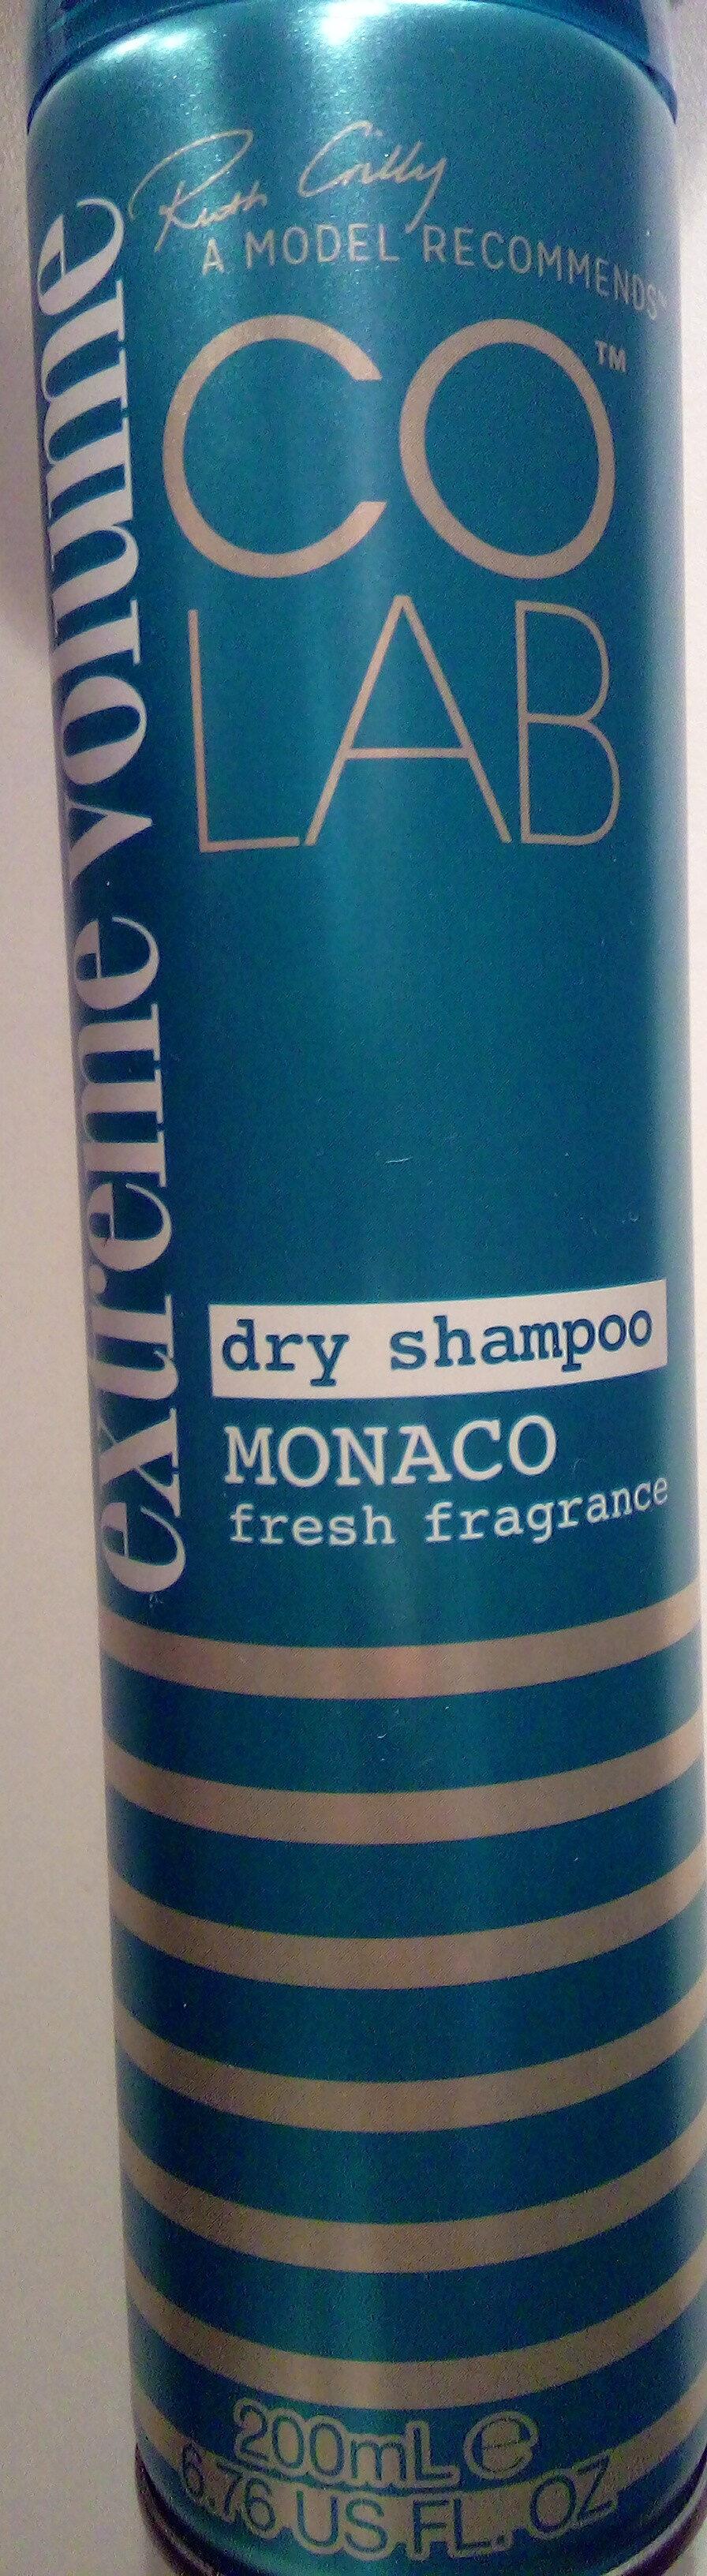 Shampooing sec Monaco - Product - fr